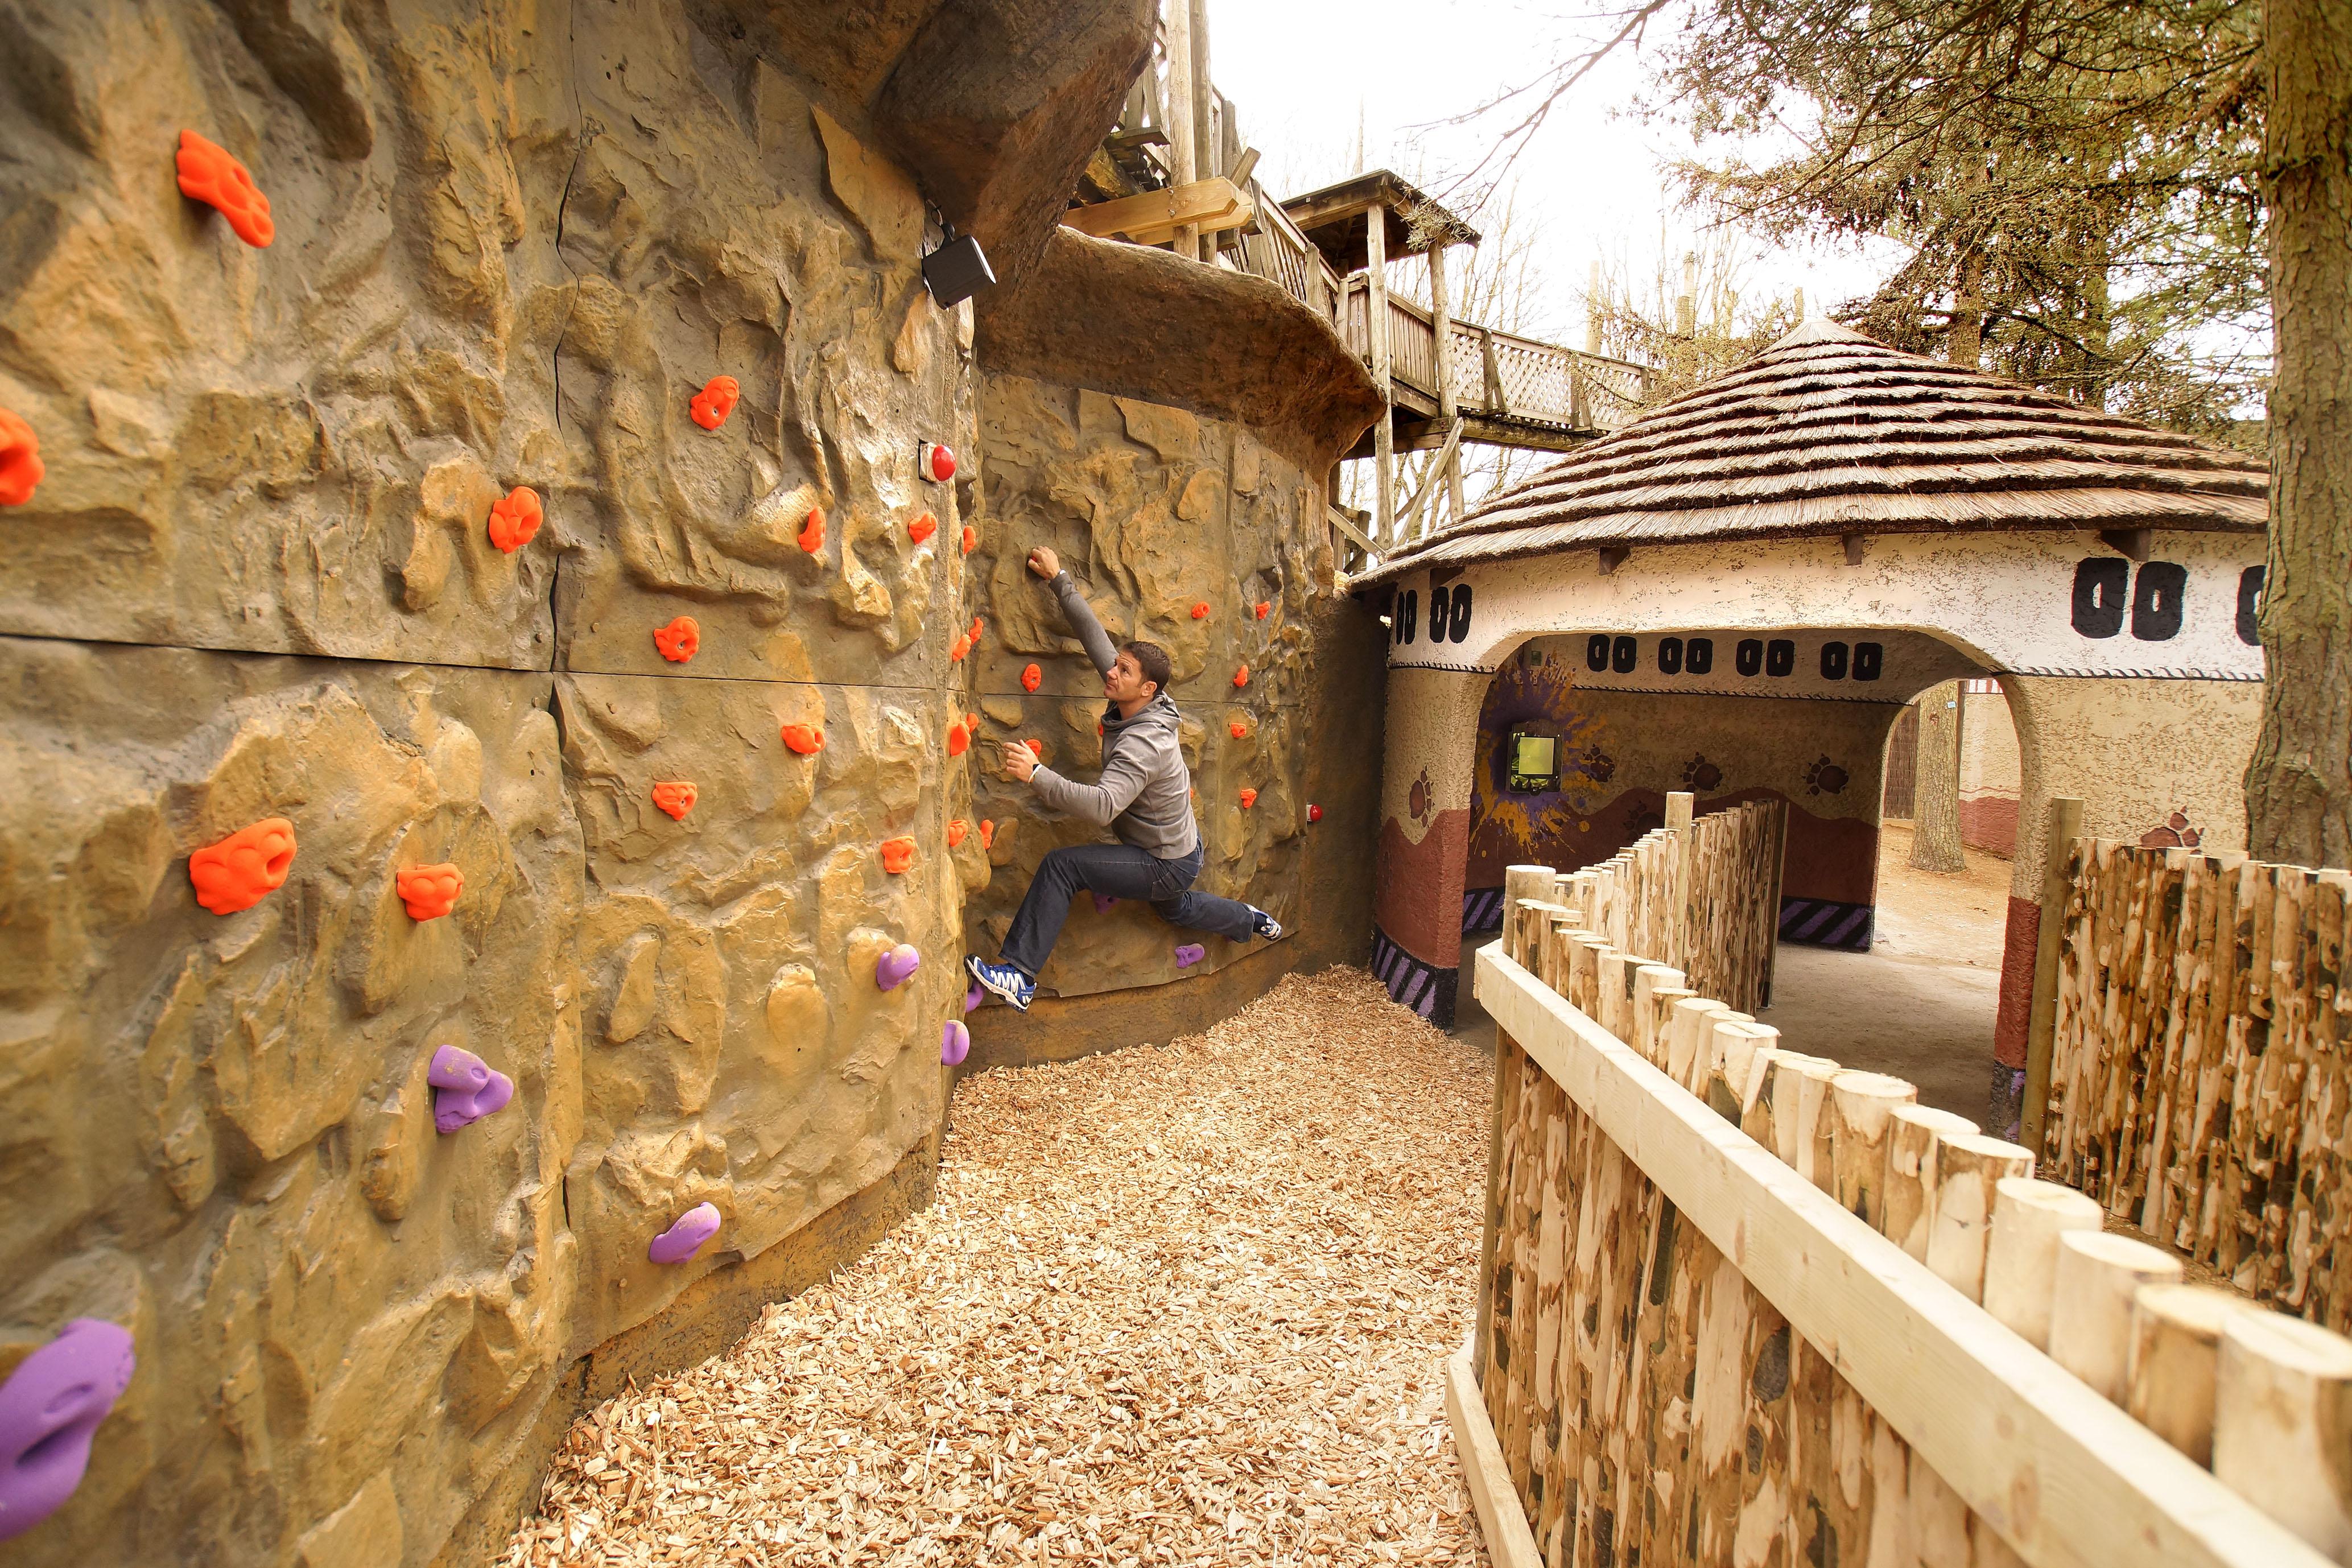 Climbing Walls Innovative Leisure